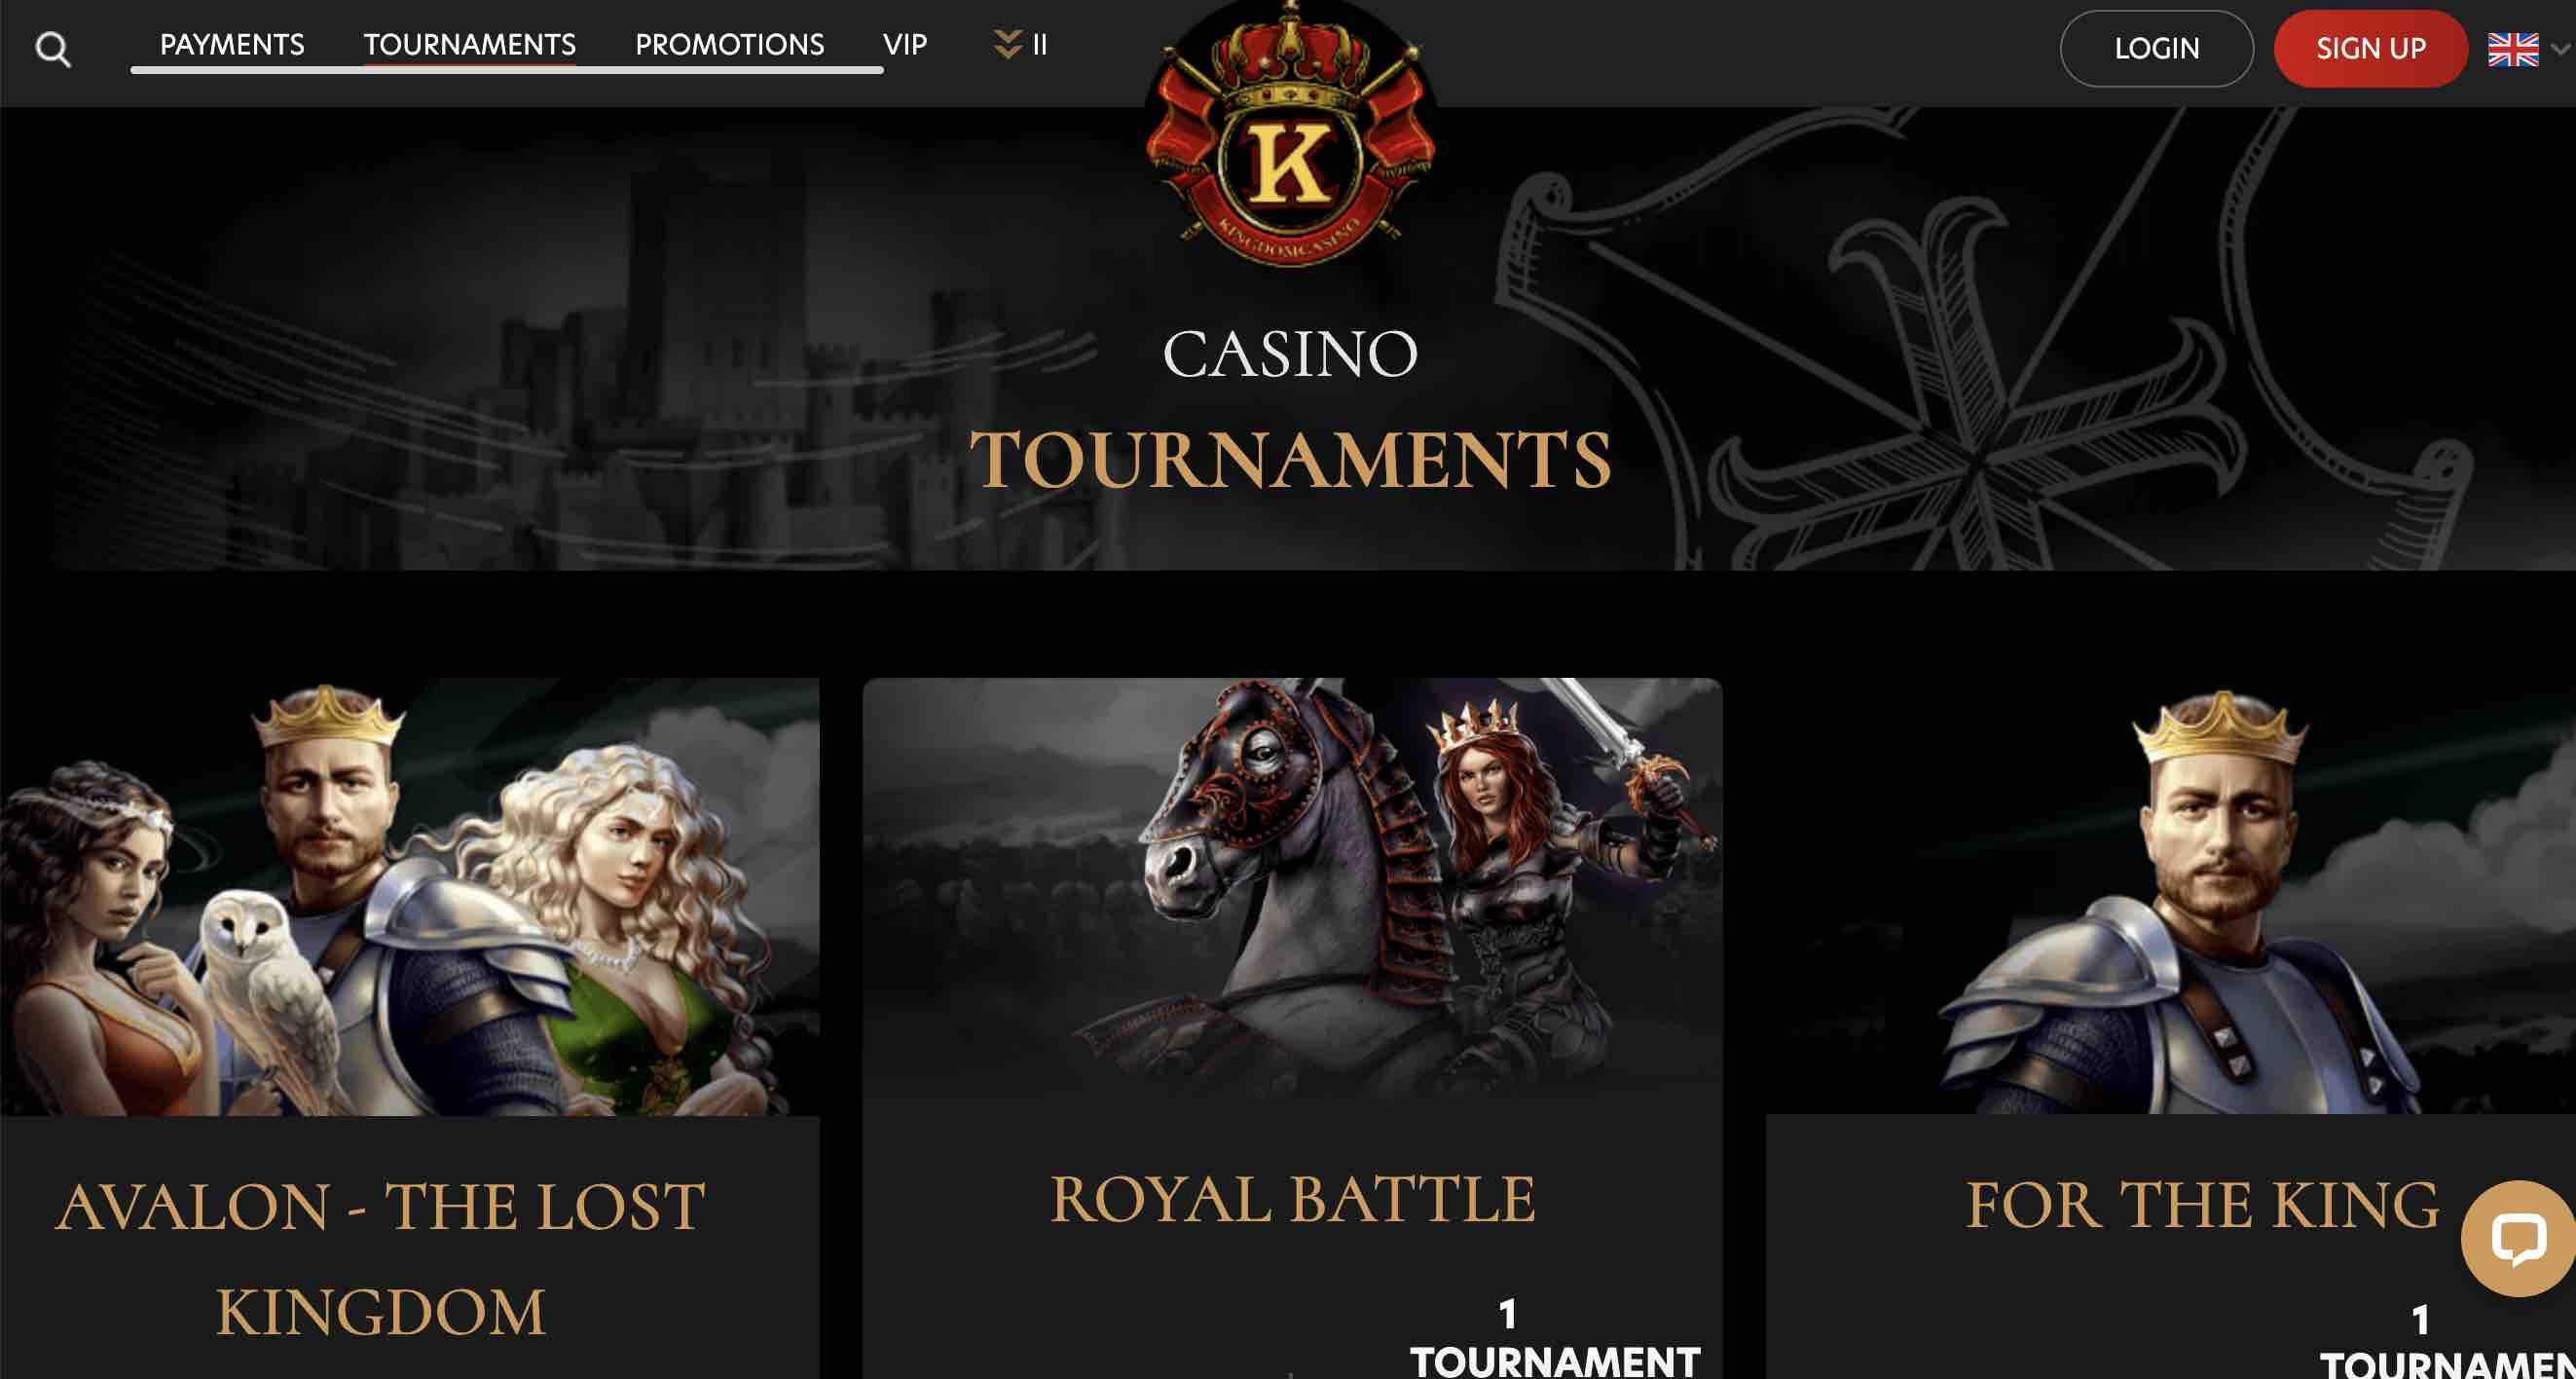 Tournaments at Kingdom Casino